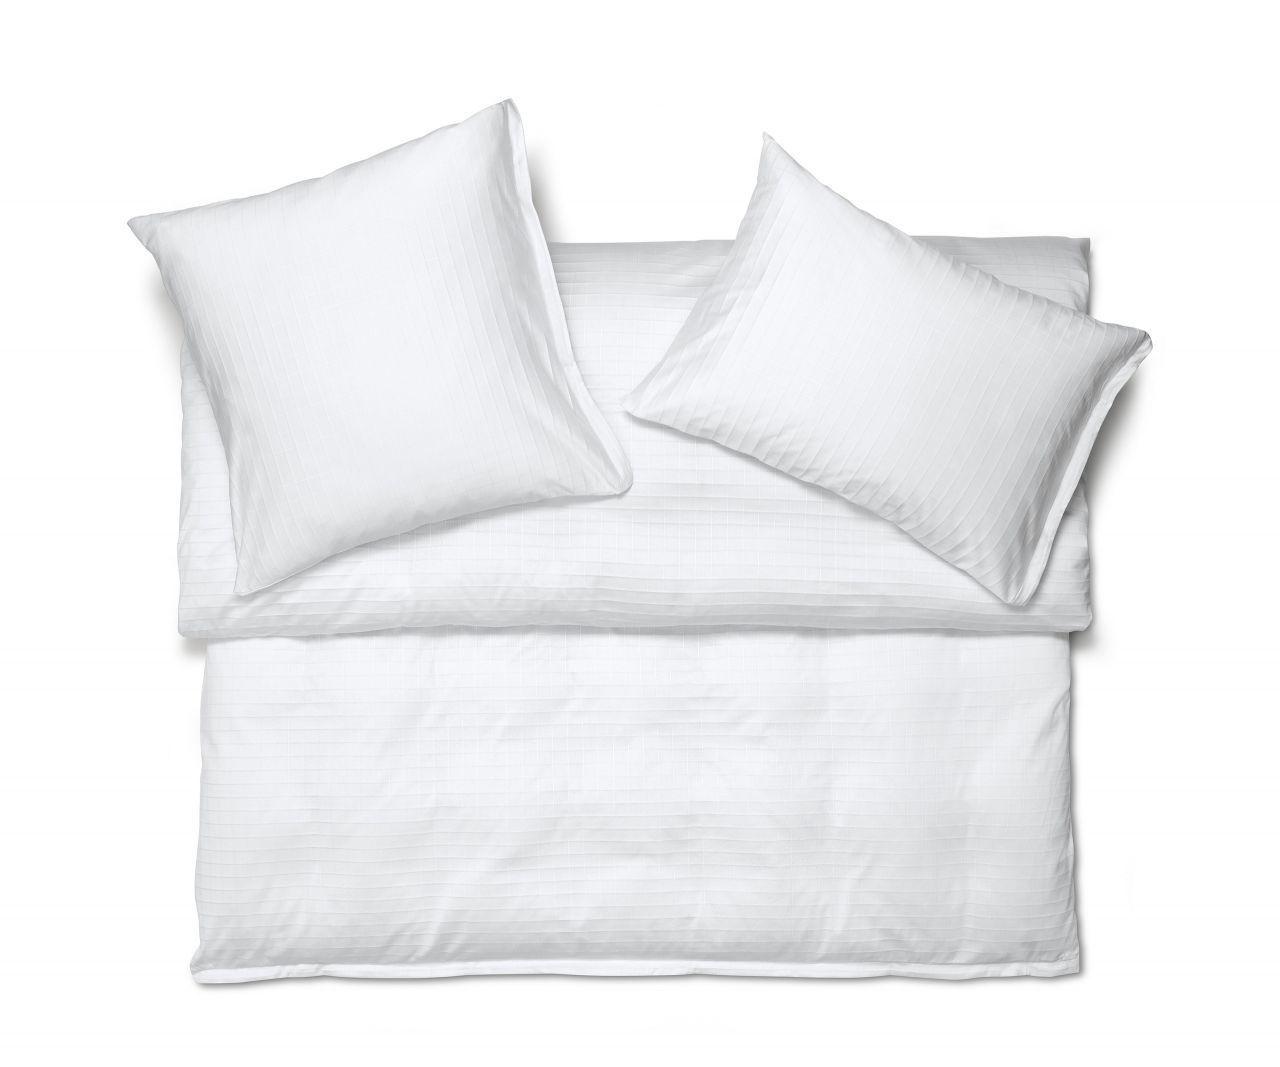 schlossberg jersey ornato bettw sche kent blanc boudoir. Black Bedroom Furniture Sets. Home Design Ideas